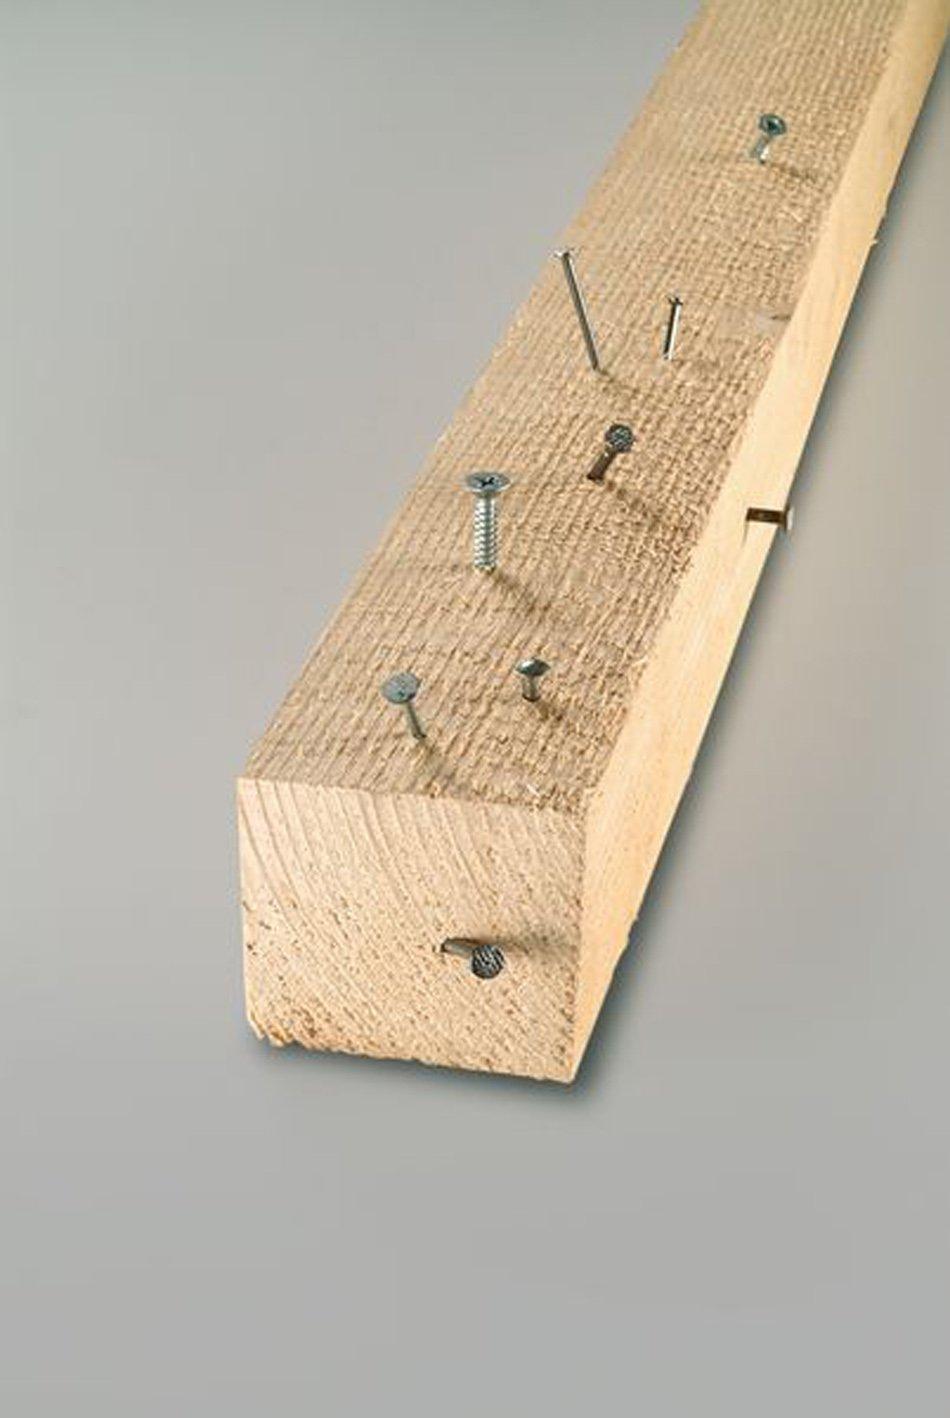 2 St/ück, S 1411 DF Bosch DIY S/äbels/ägeblatt Heavy for Wood and Metal zum S/ägen in Holz und Metall